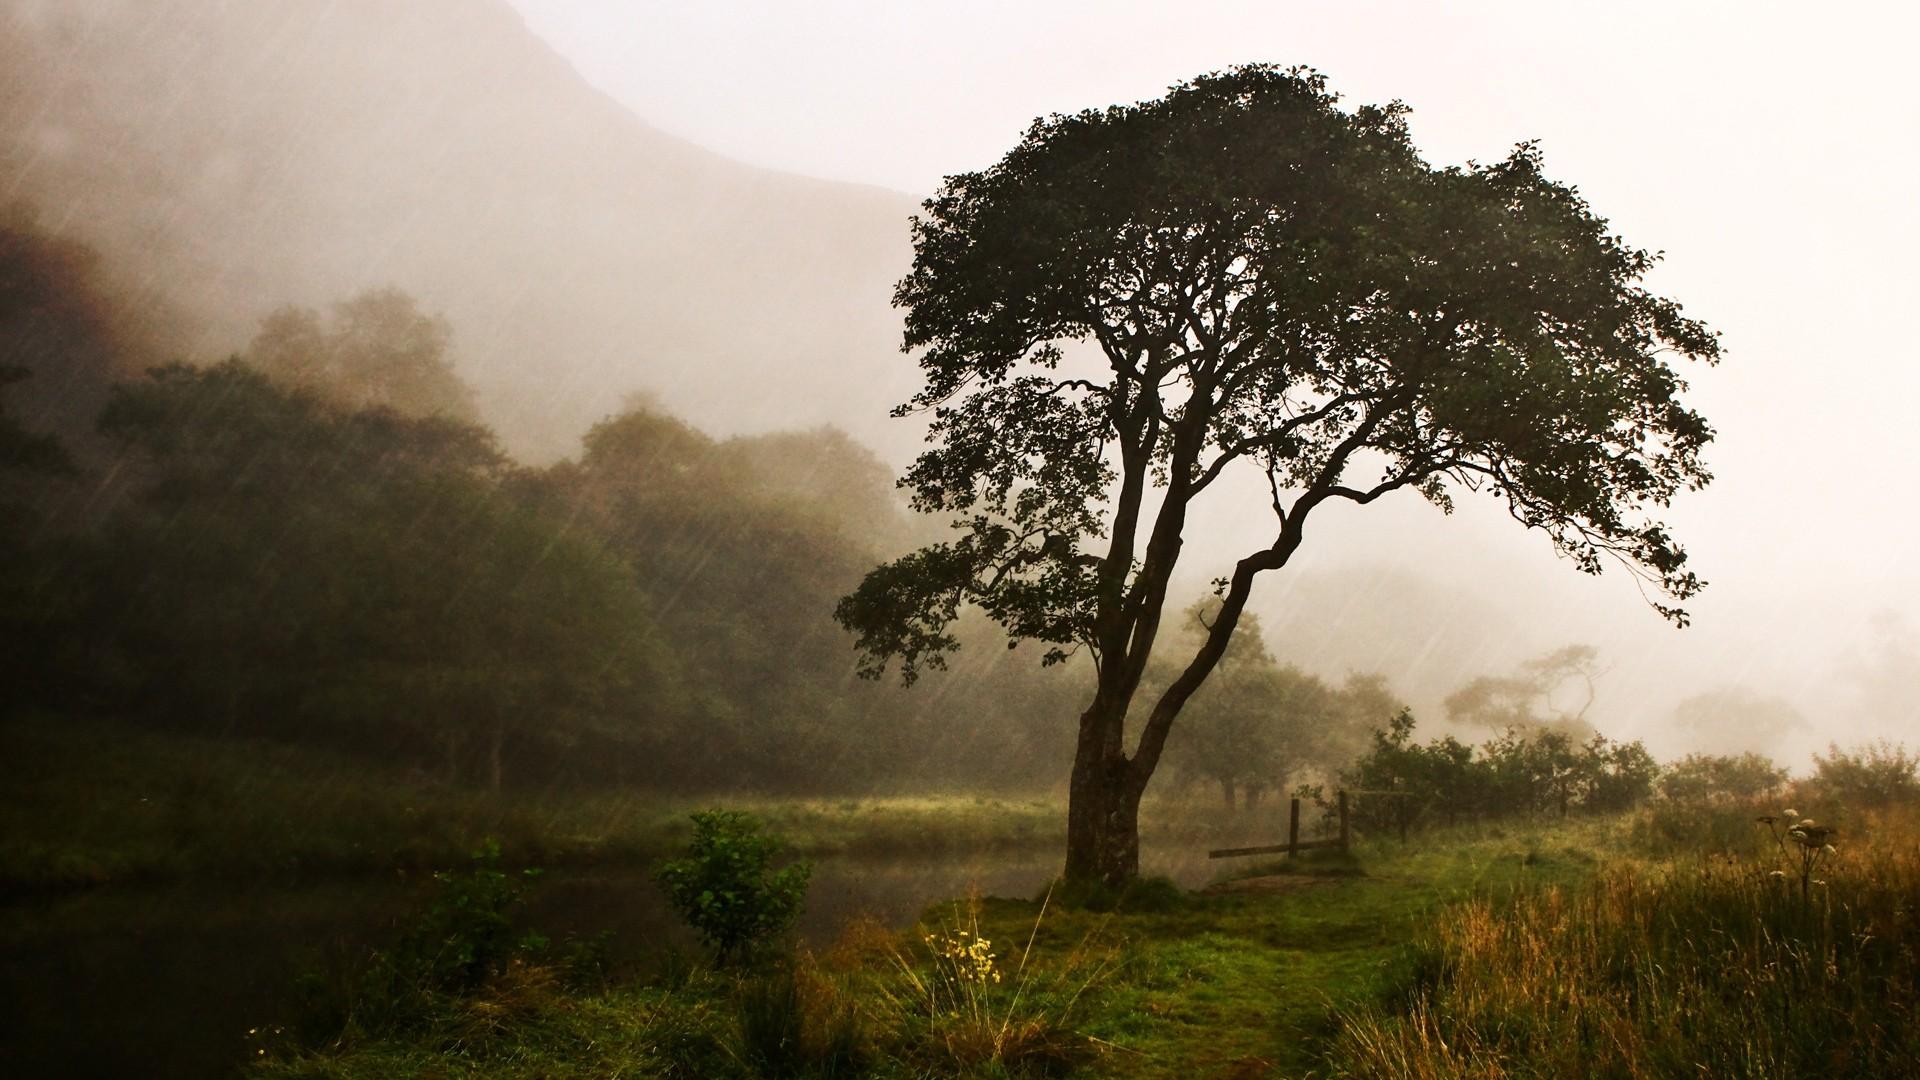 Preview wallpaper rain, tree, streams, bad weather, precipitation, green,  despondency